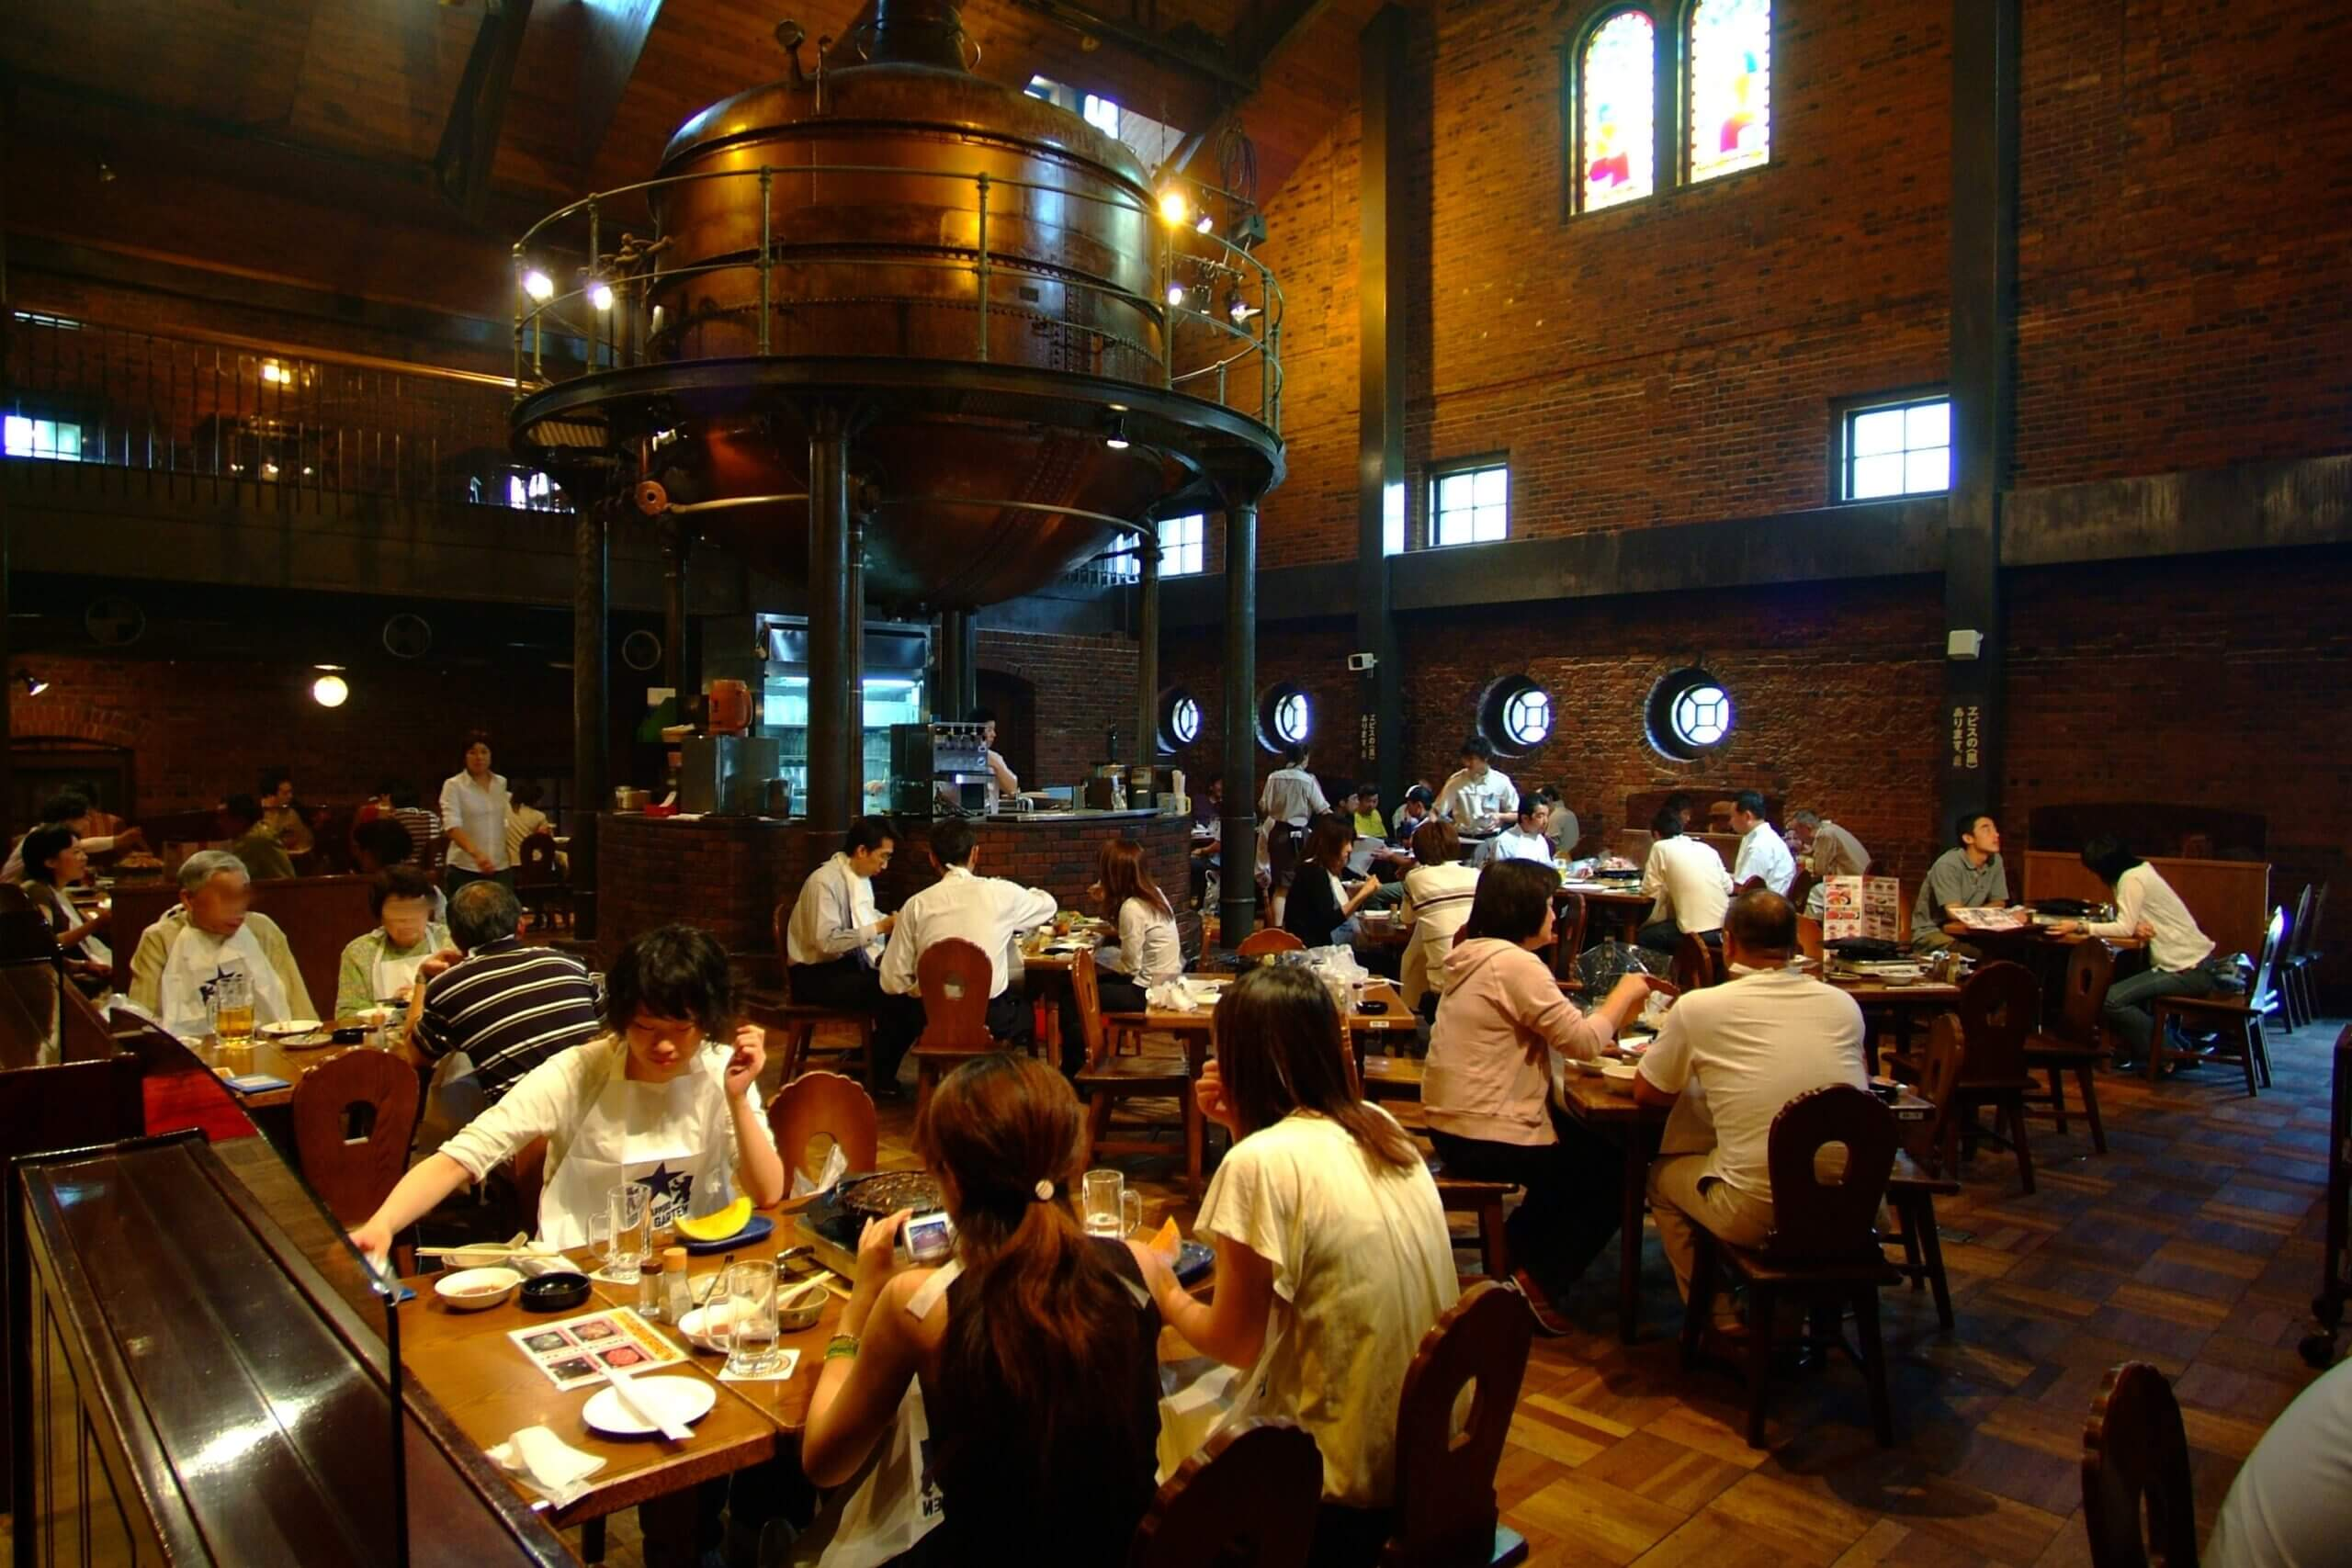 Sapporo Bier Garten: The Home of Sapporo Beer